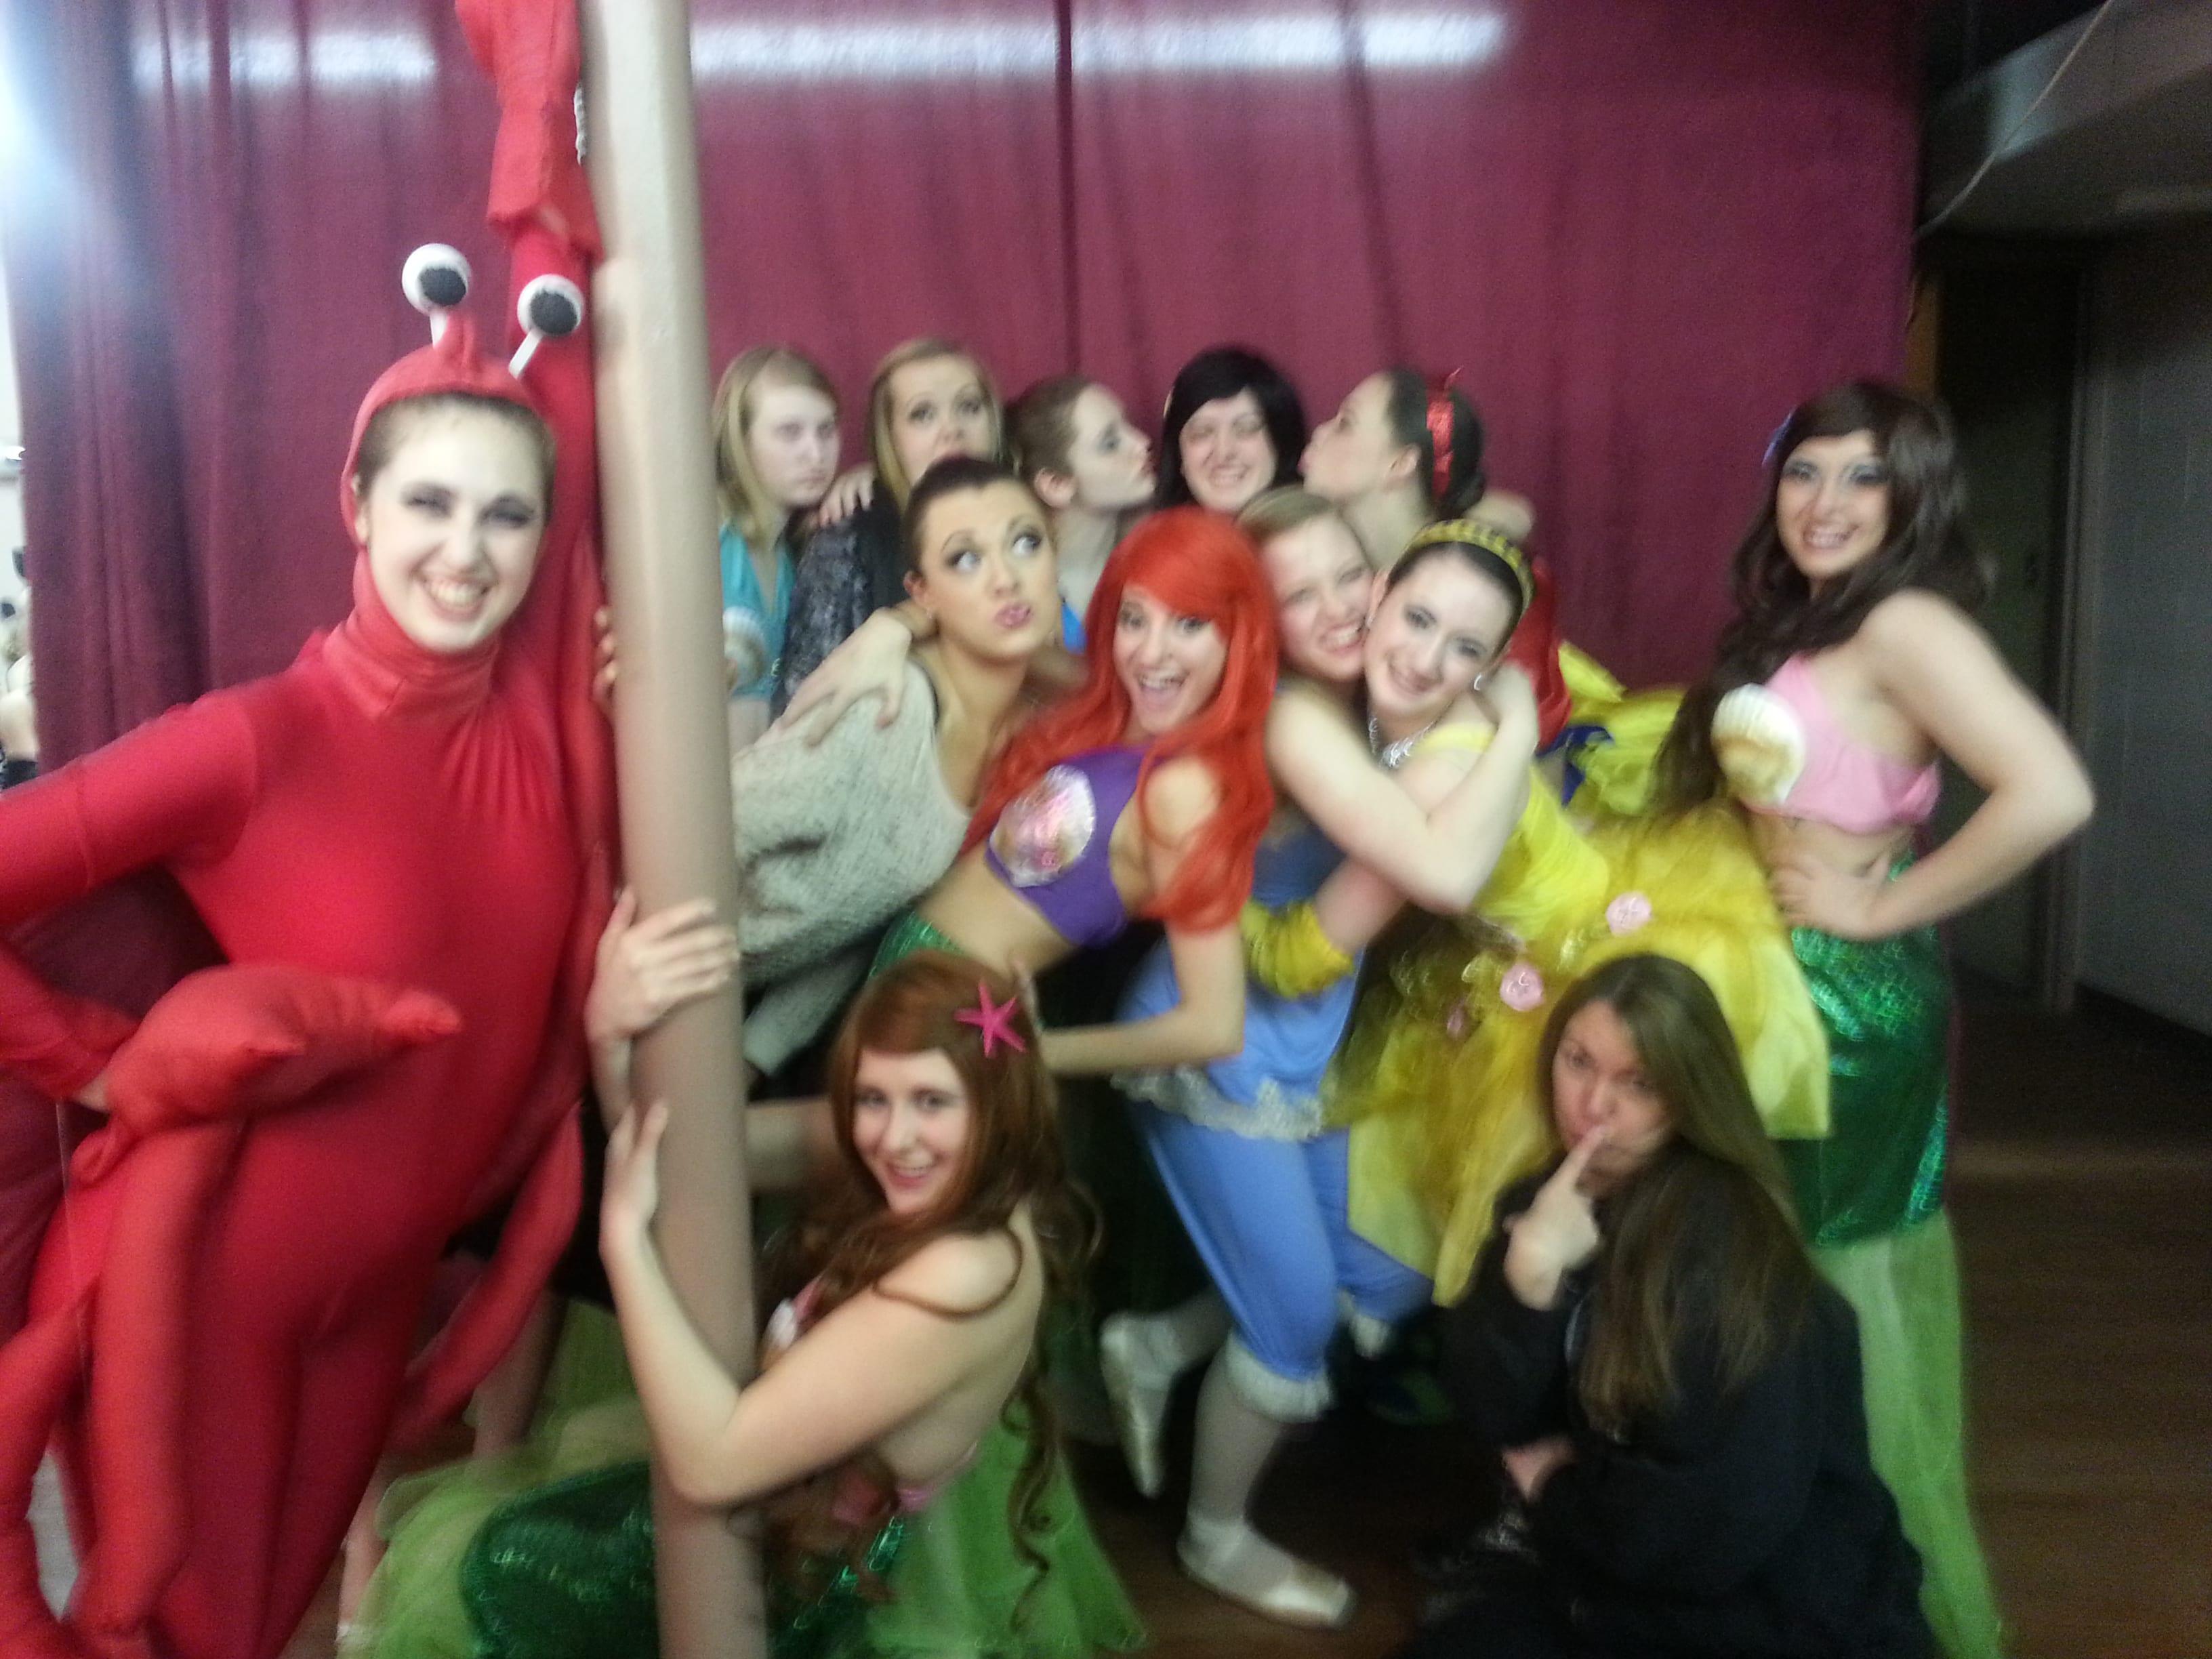 20130317_135458(0) – Beth Fowler School of Dance : Genoa and St. Charles Illinois